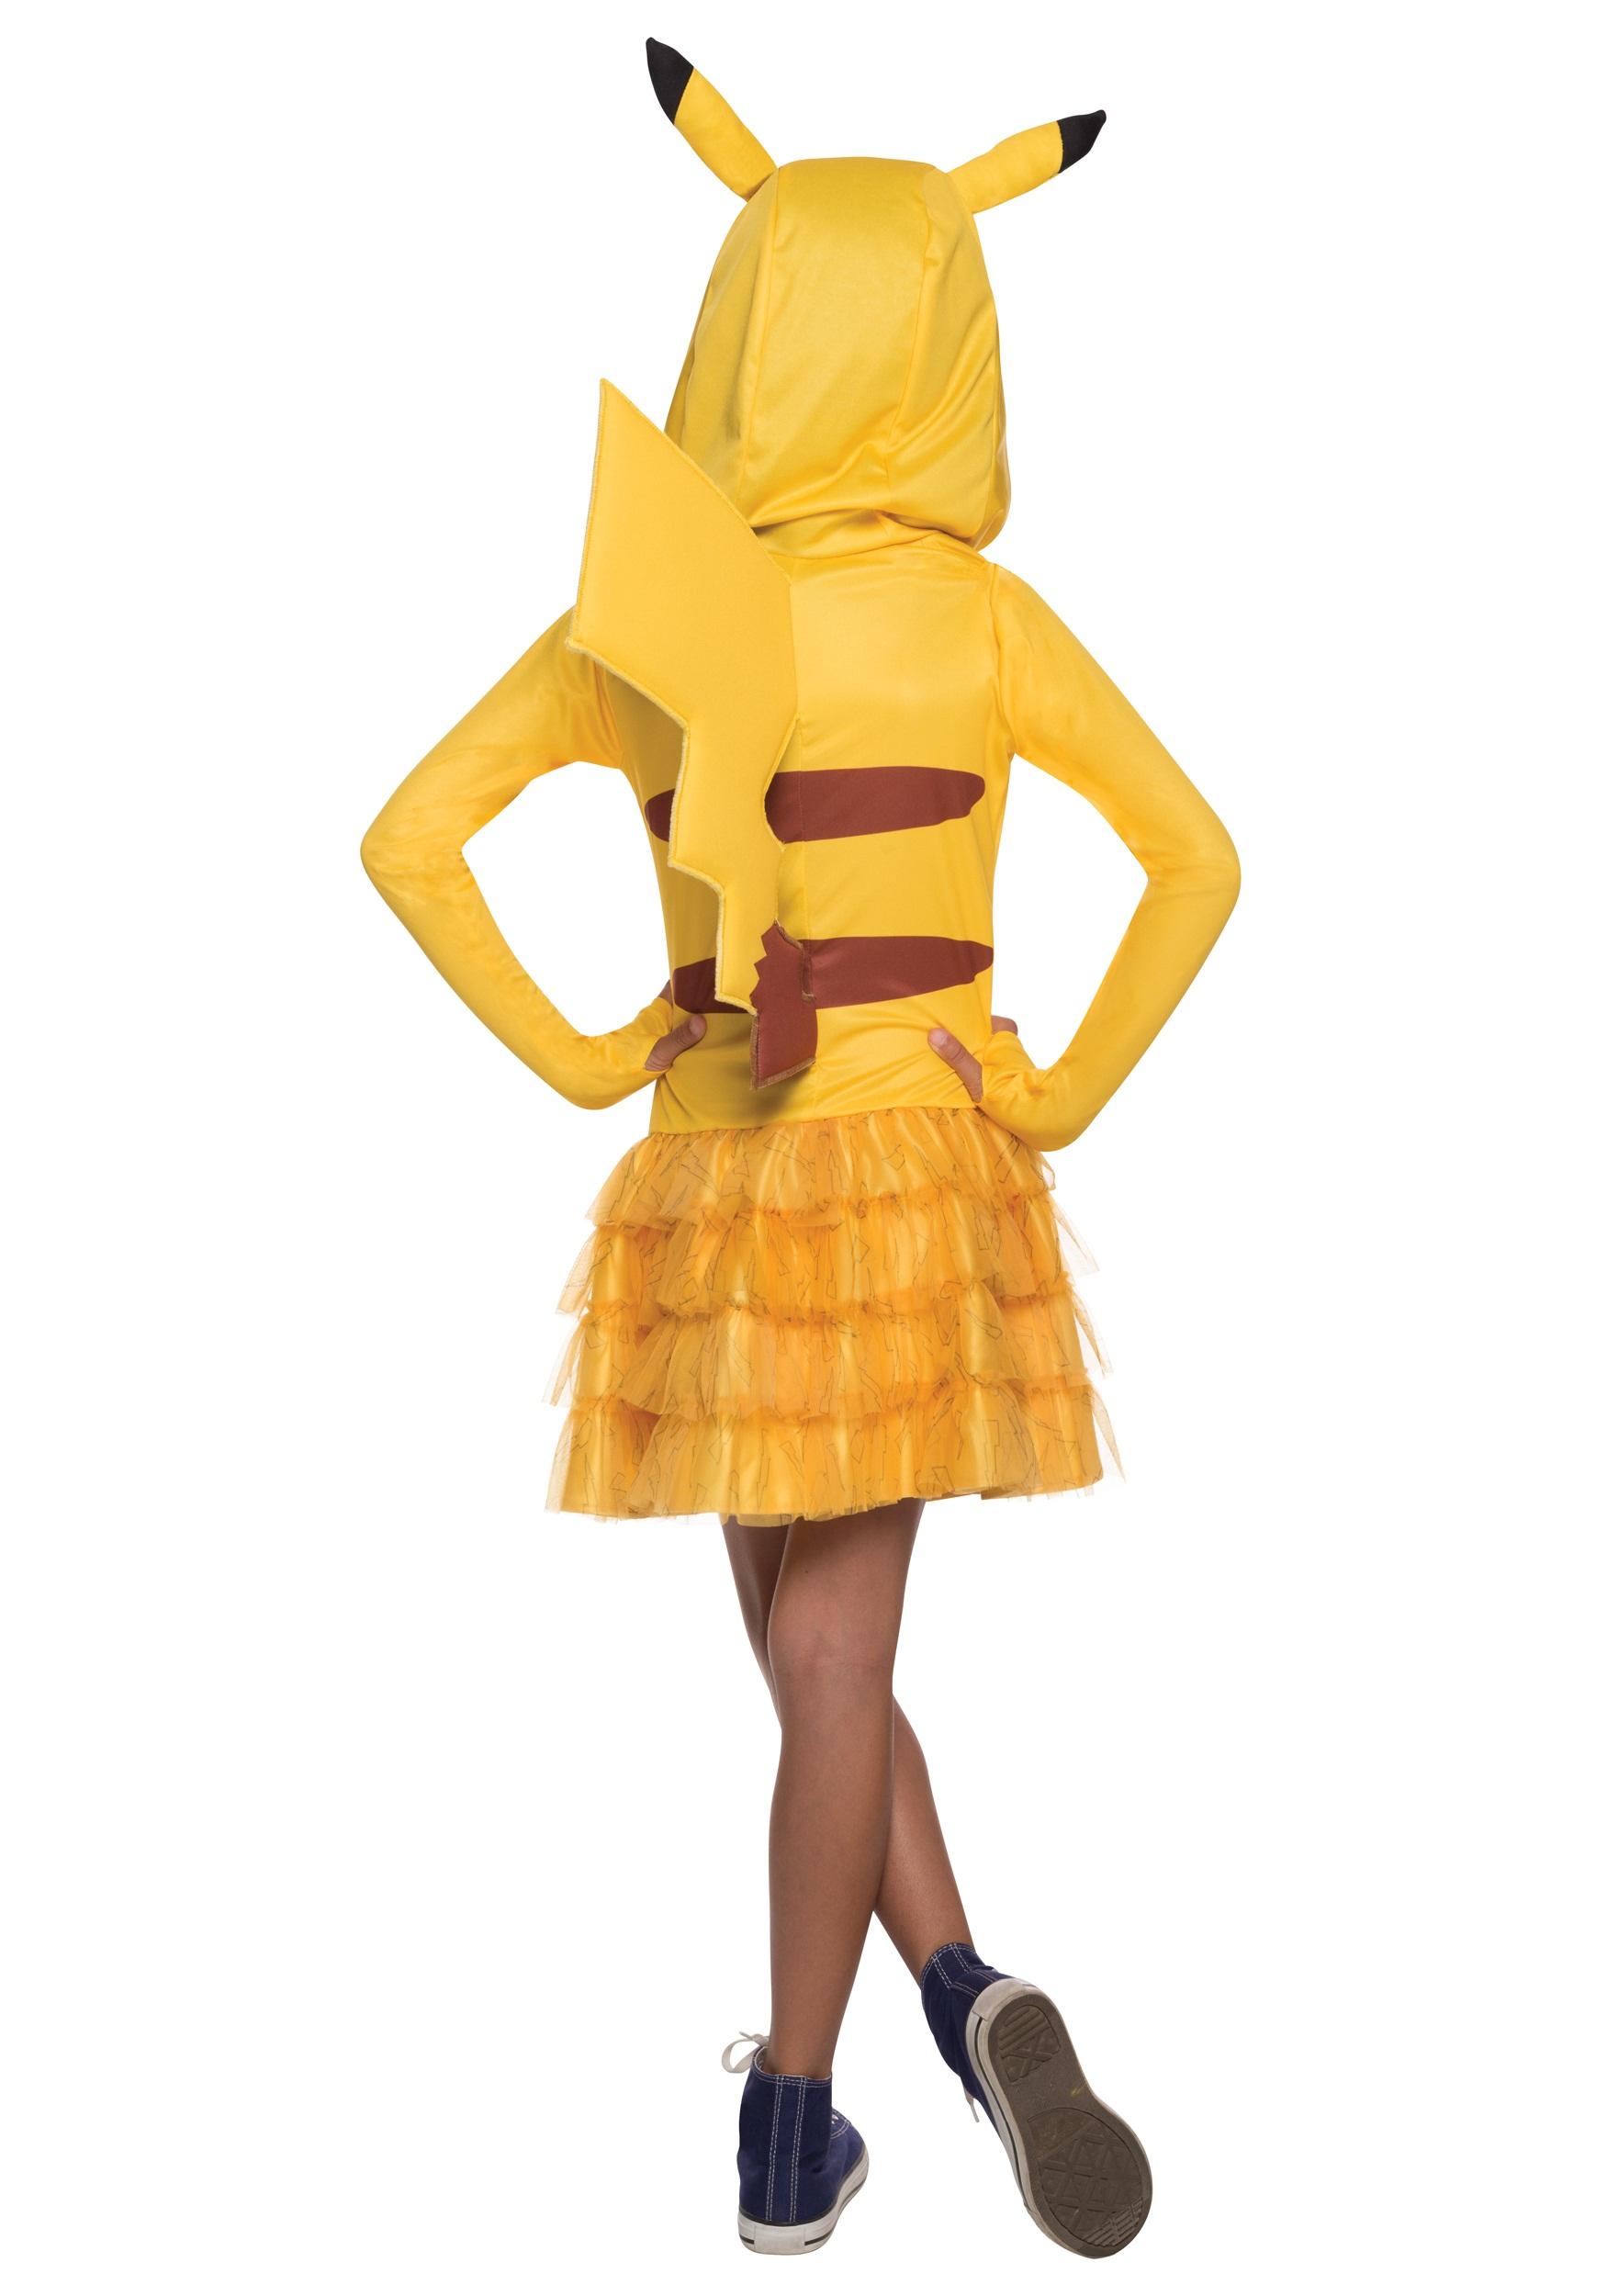 Girls Pikachu Hoodie Dress Girls Pikachu Hoodie Dress logo. Buy New$39.99